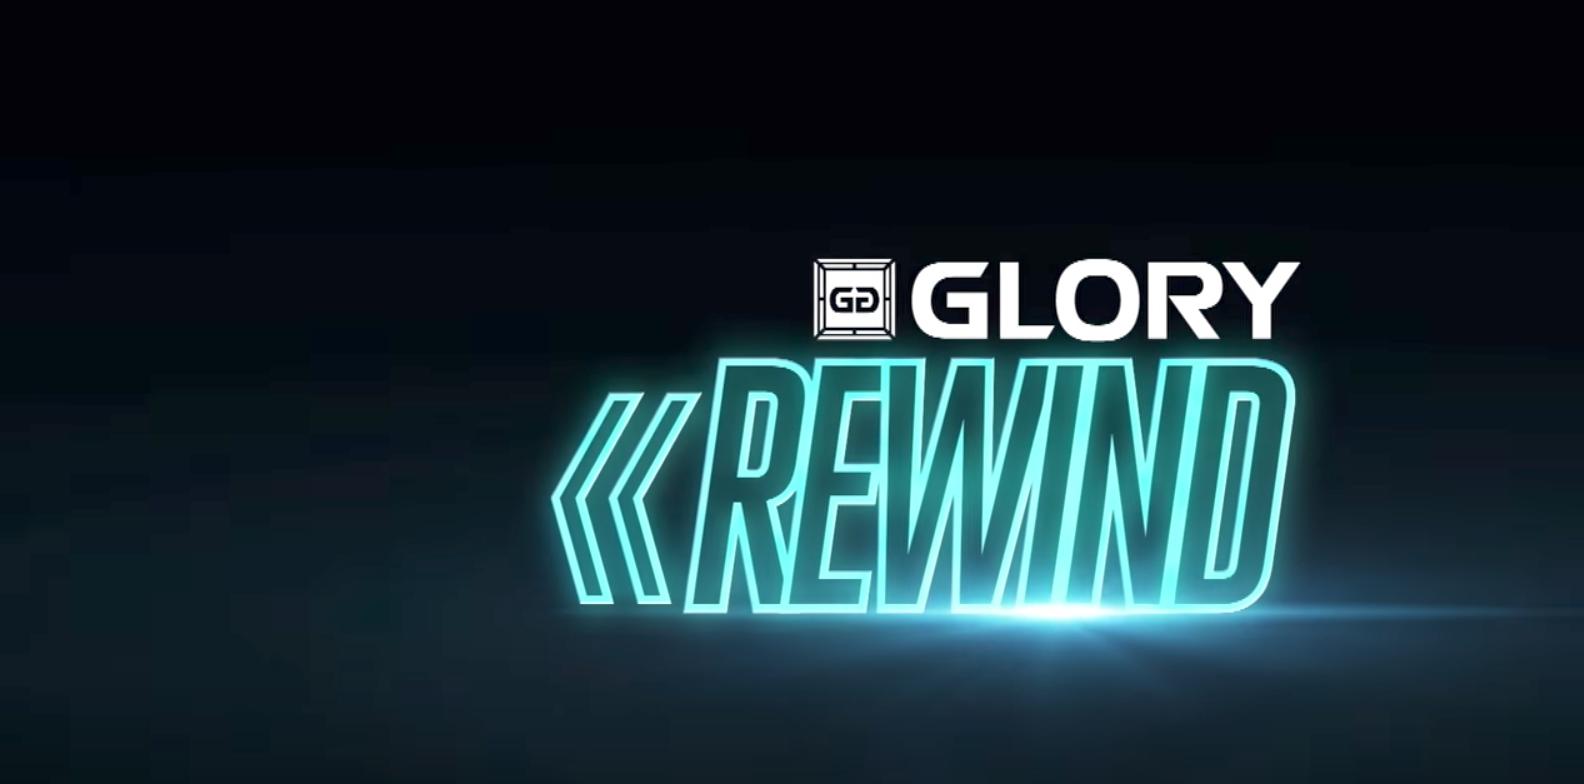 GLORY 43 New York: Rewind Show